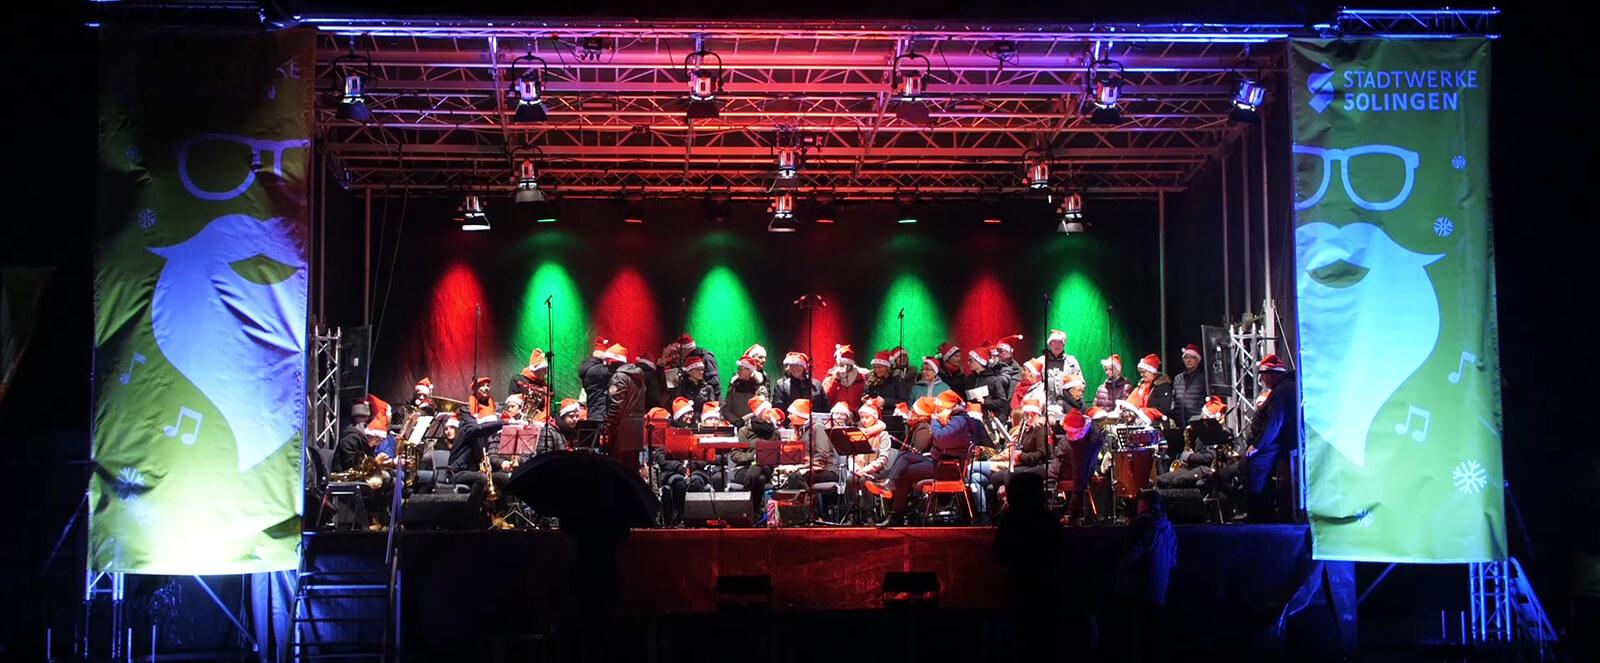 Stadtwerke-Nikolaussingen 2019